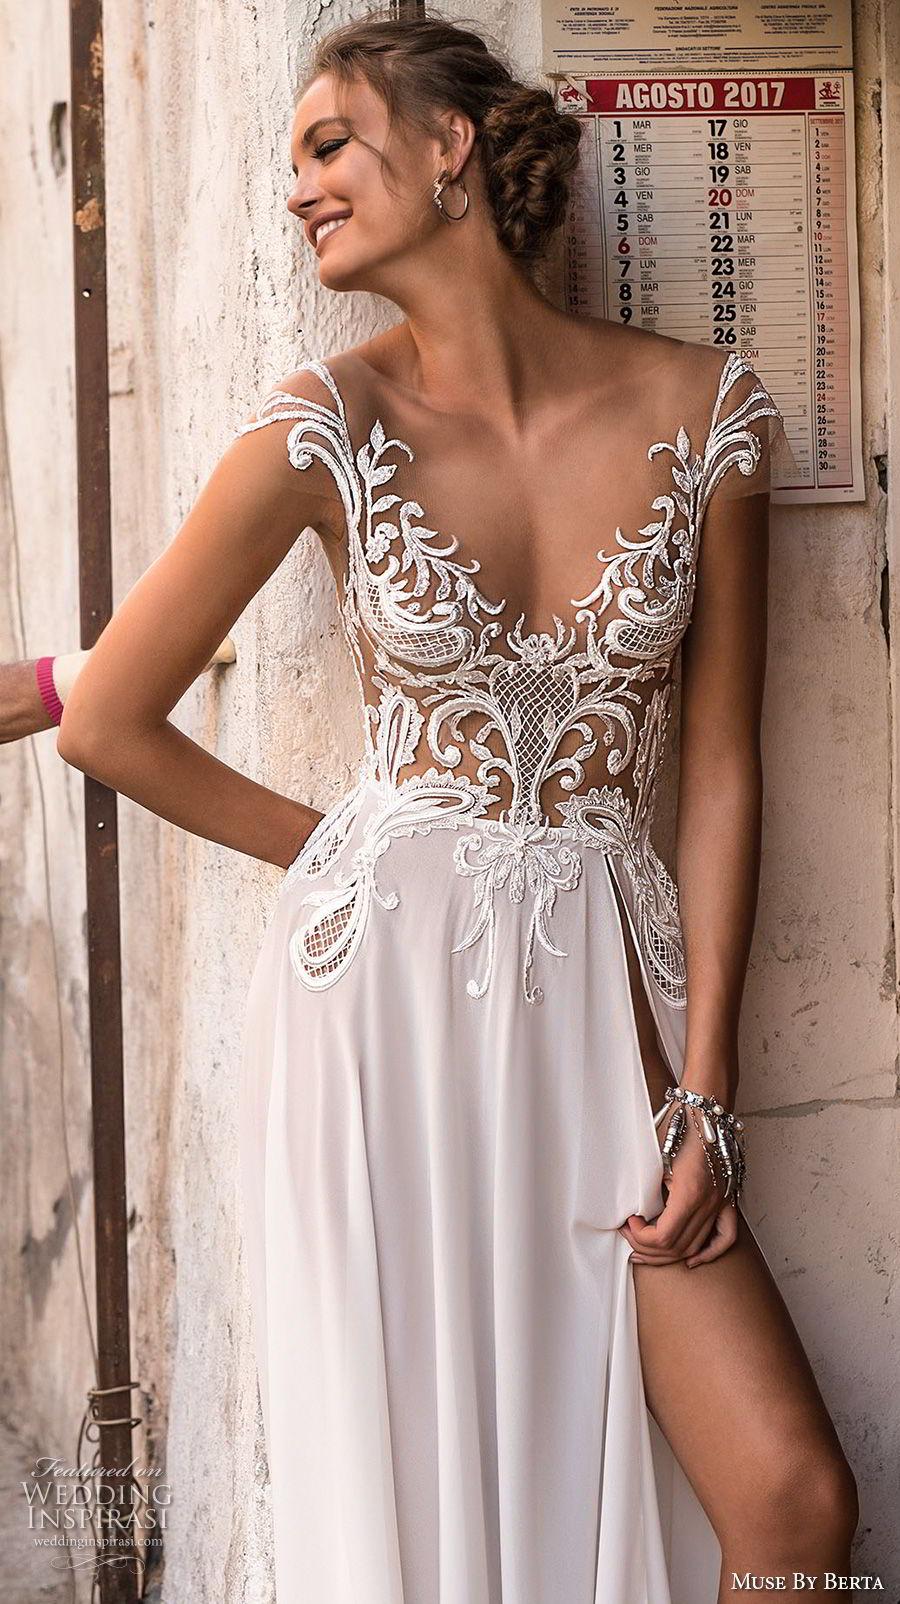 muse-berta-2018-bridal-cap-sleeves-v-neckline-heavily-embellished-bodice-high-slit-skirt-sexy-romantic-soft-a-line-wedding-dress-open-v-back-sweep-train-3-zv